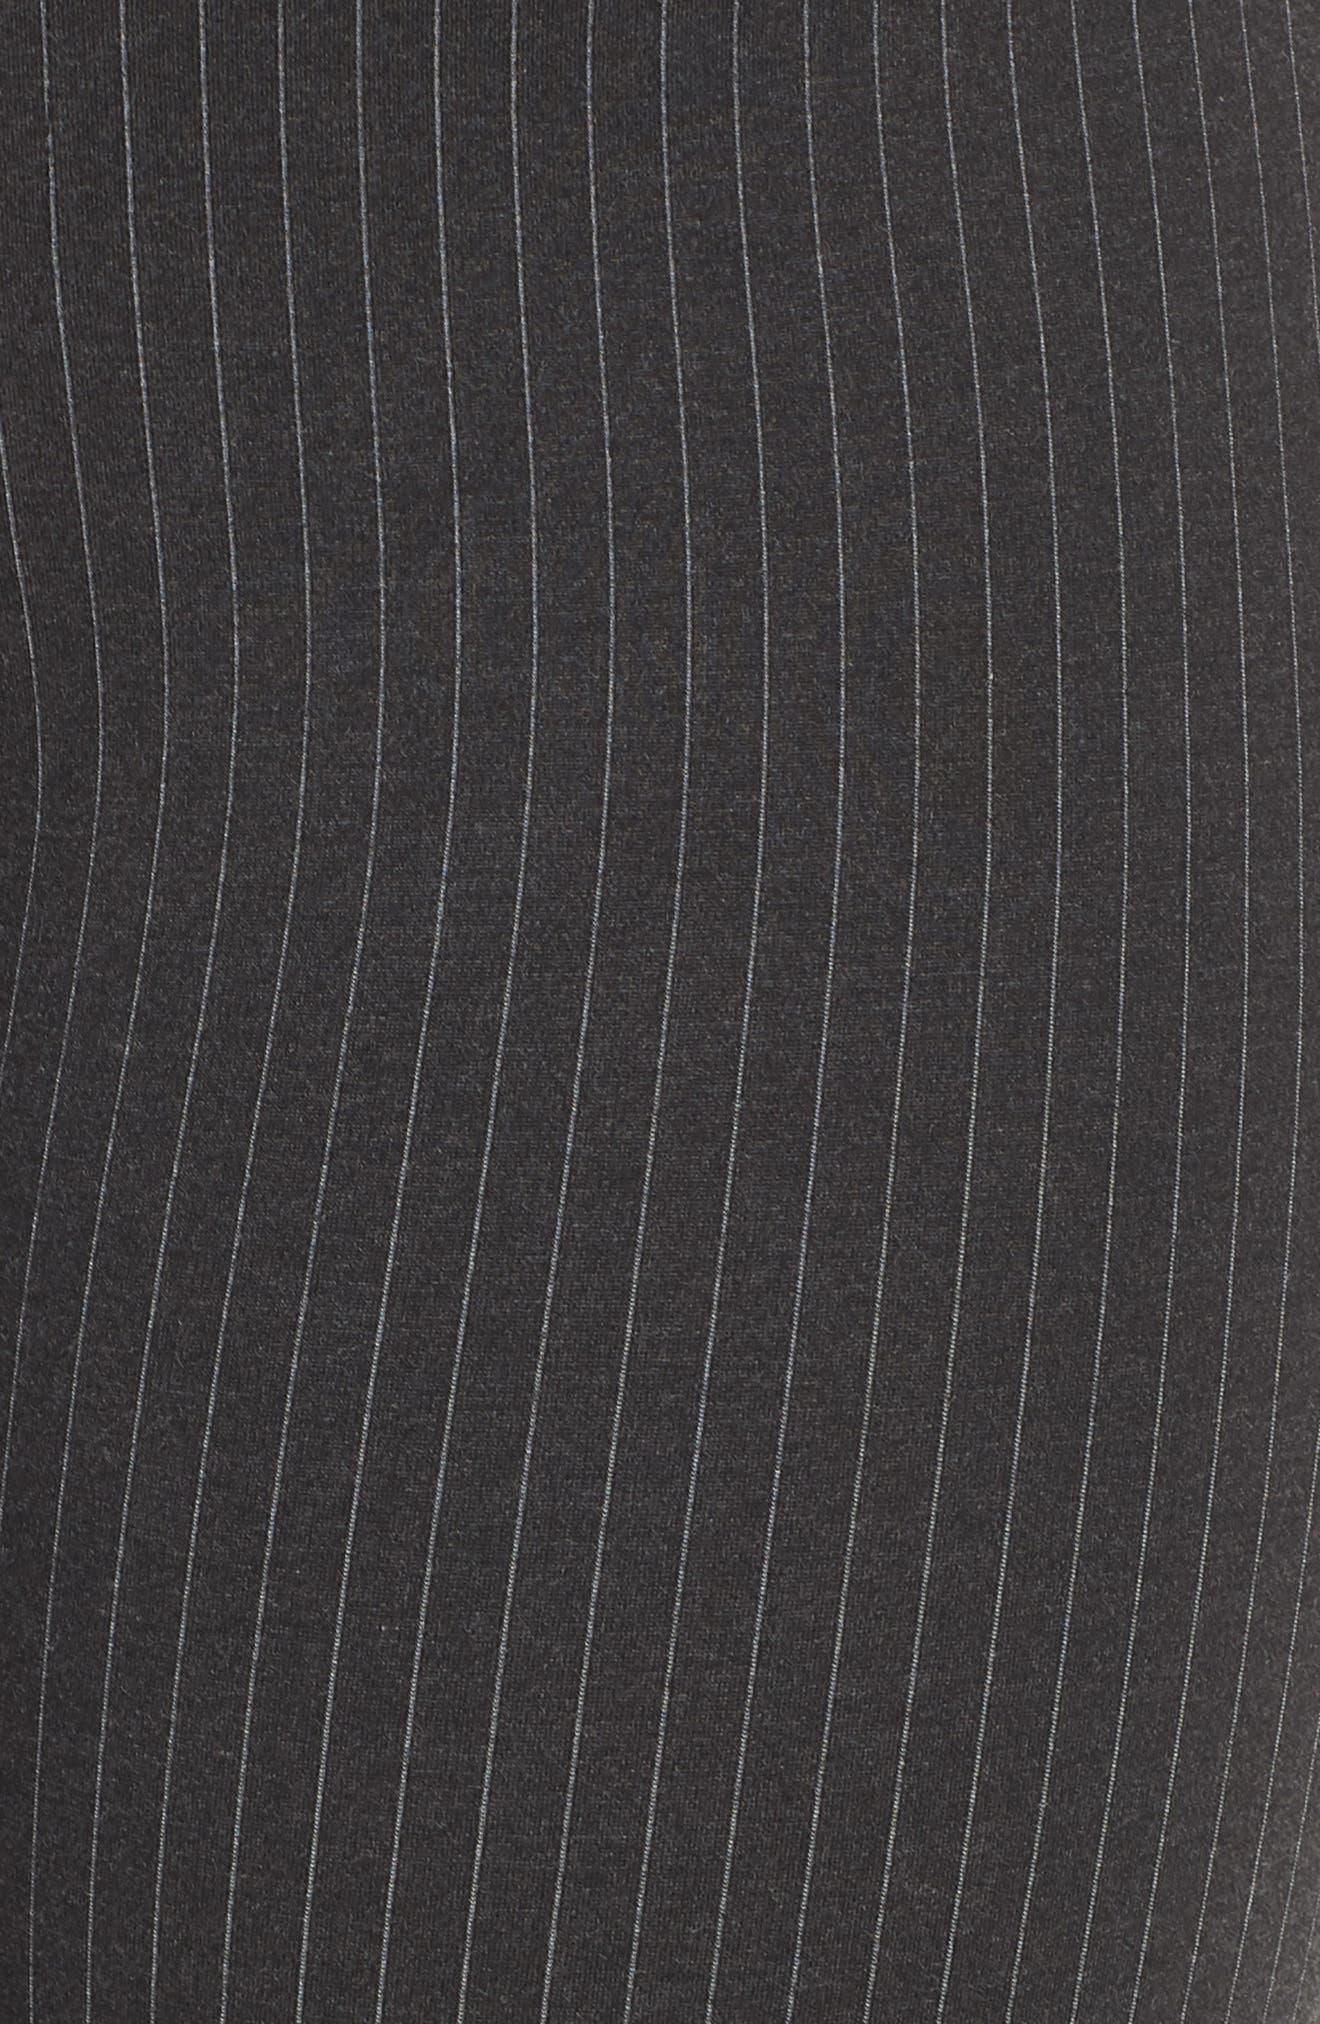 Ab-Solution Skinny Ponte Pants,                             Alternate thumbnail 12, color,                             CHARCOAL PIN STRIPE